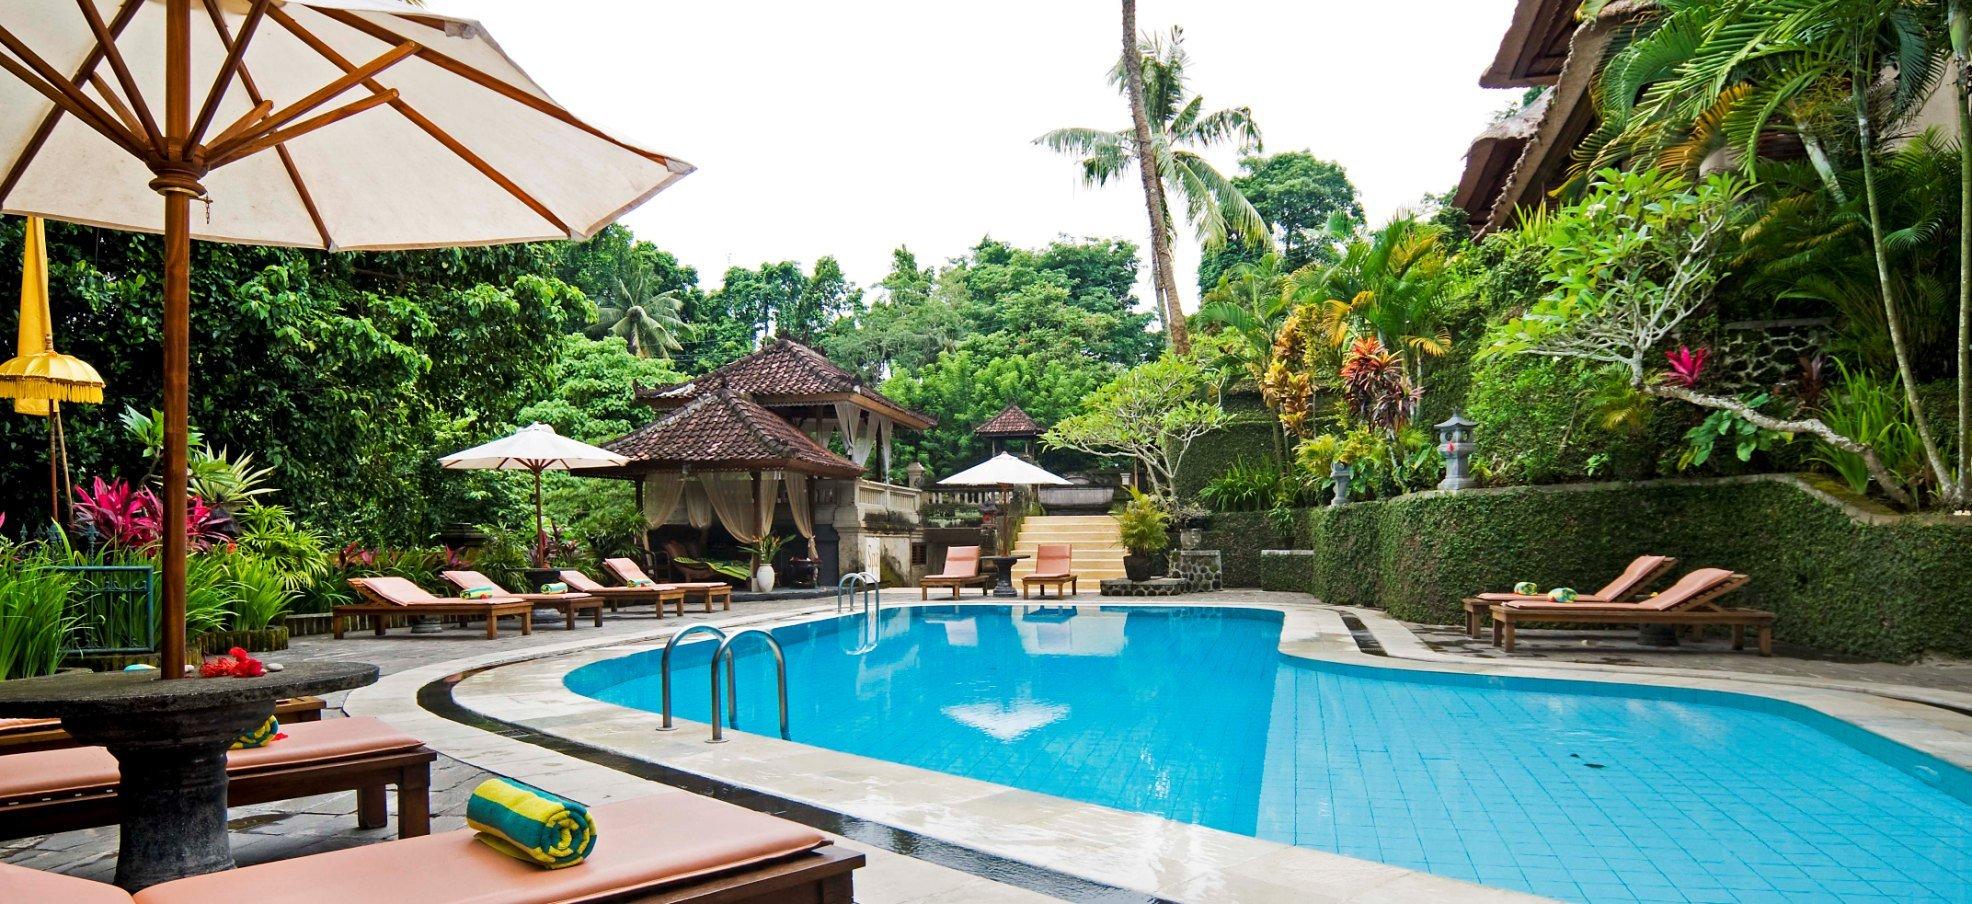 Champlung Sari - Ubud